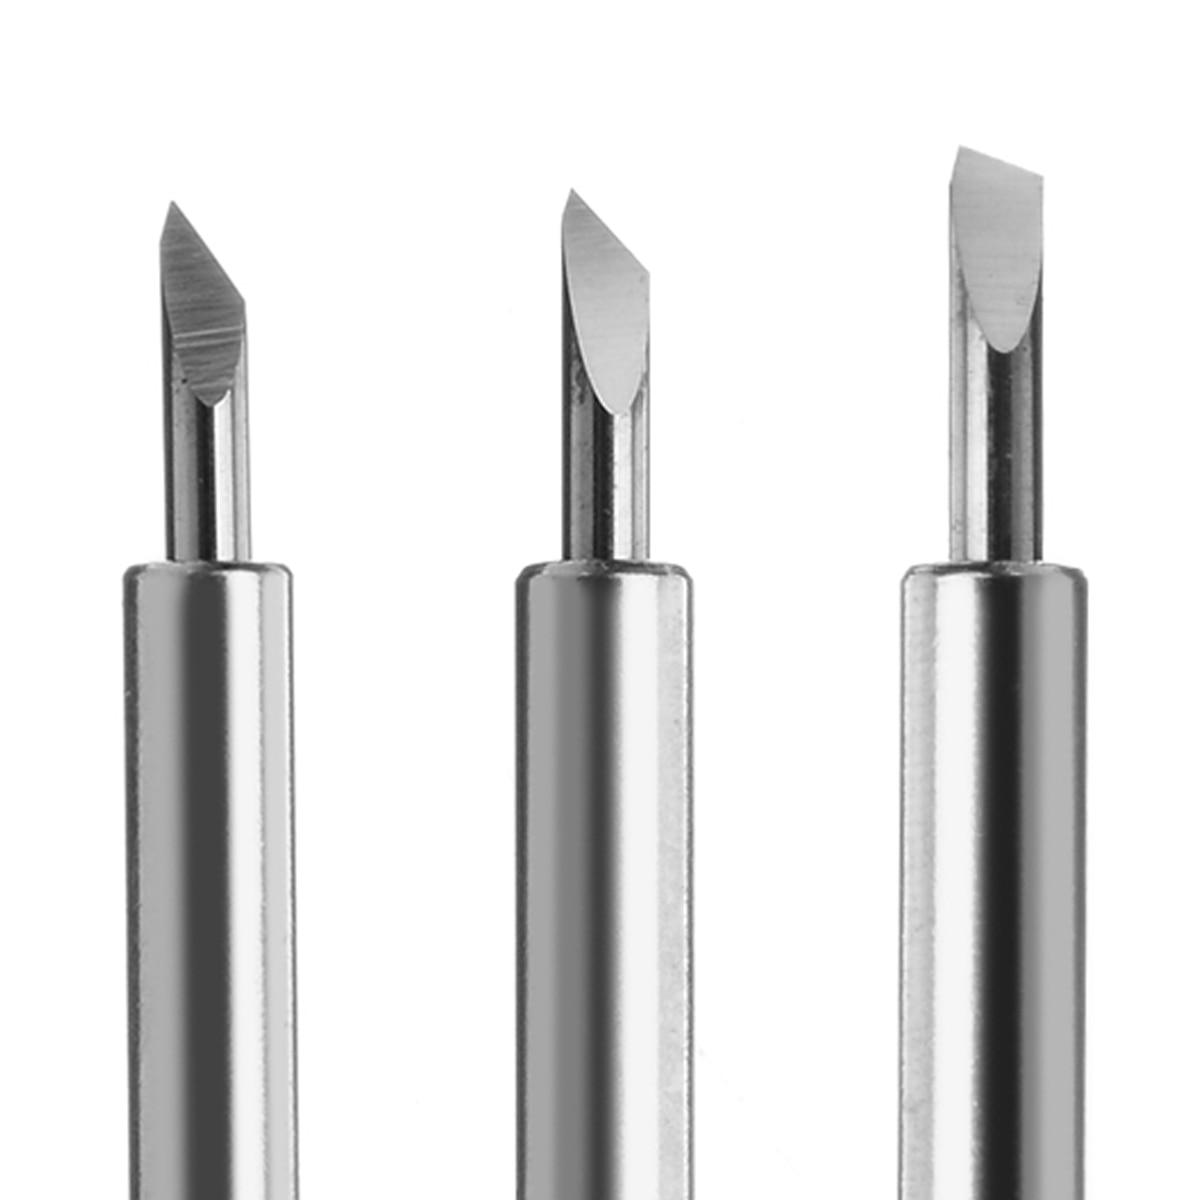 25pcs 30/45/60 Degree Roland Cricut Cutting Plotter Vinyl Cutter Knife Blades Offset Cricut Machine for Sharp & Carving Tools enlarge